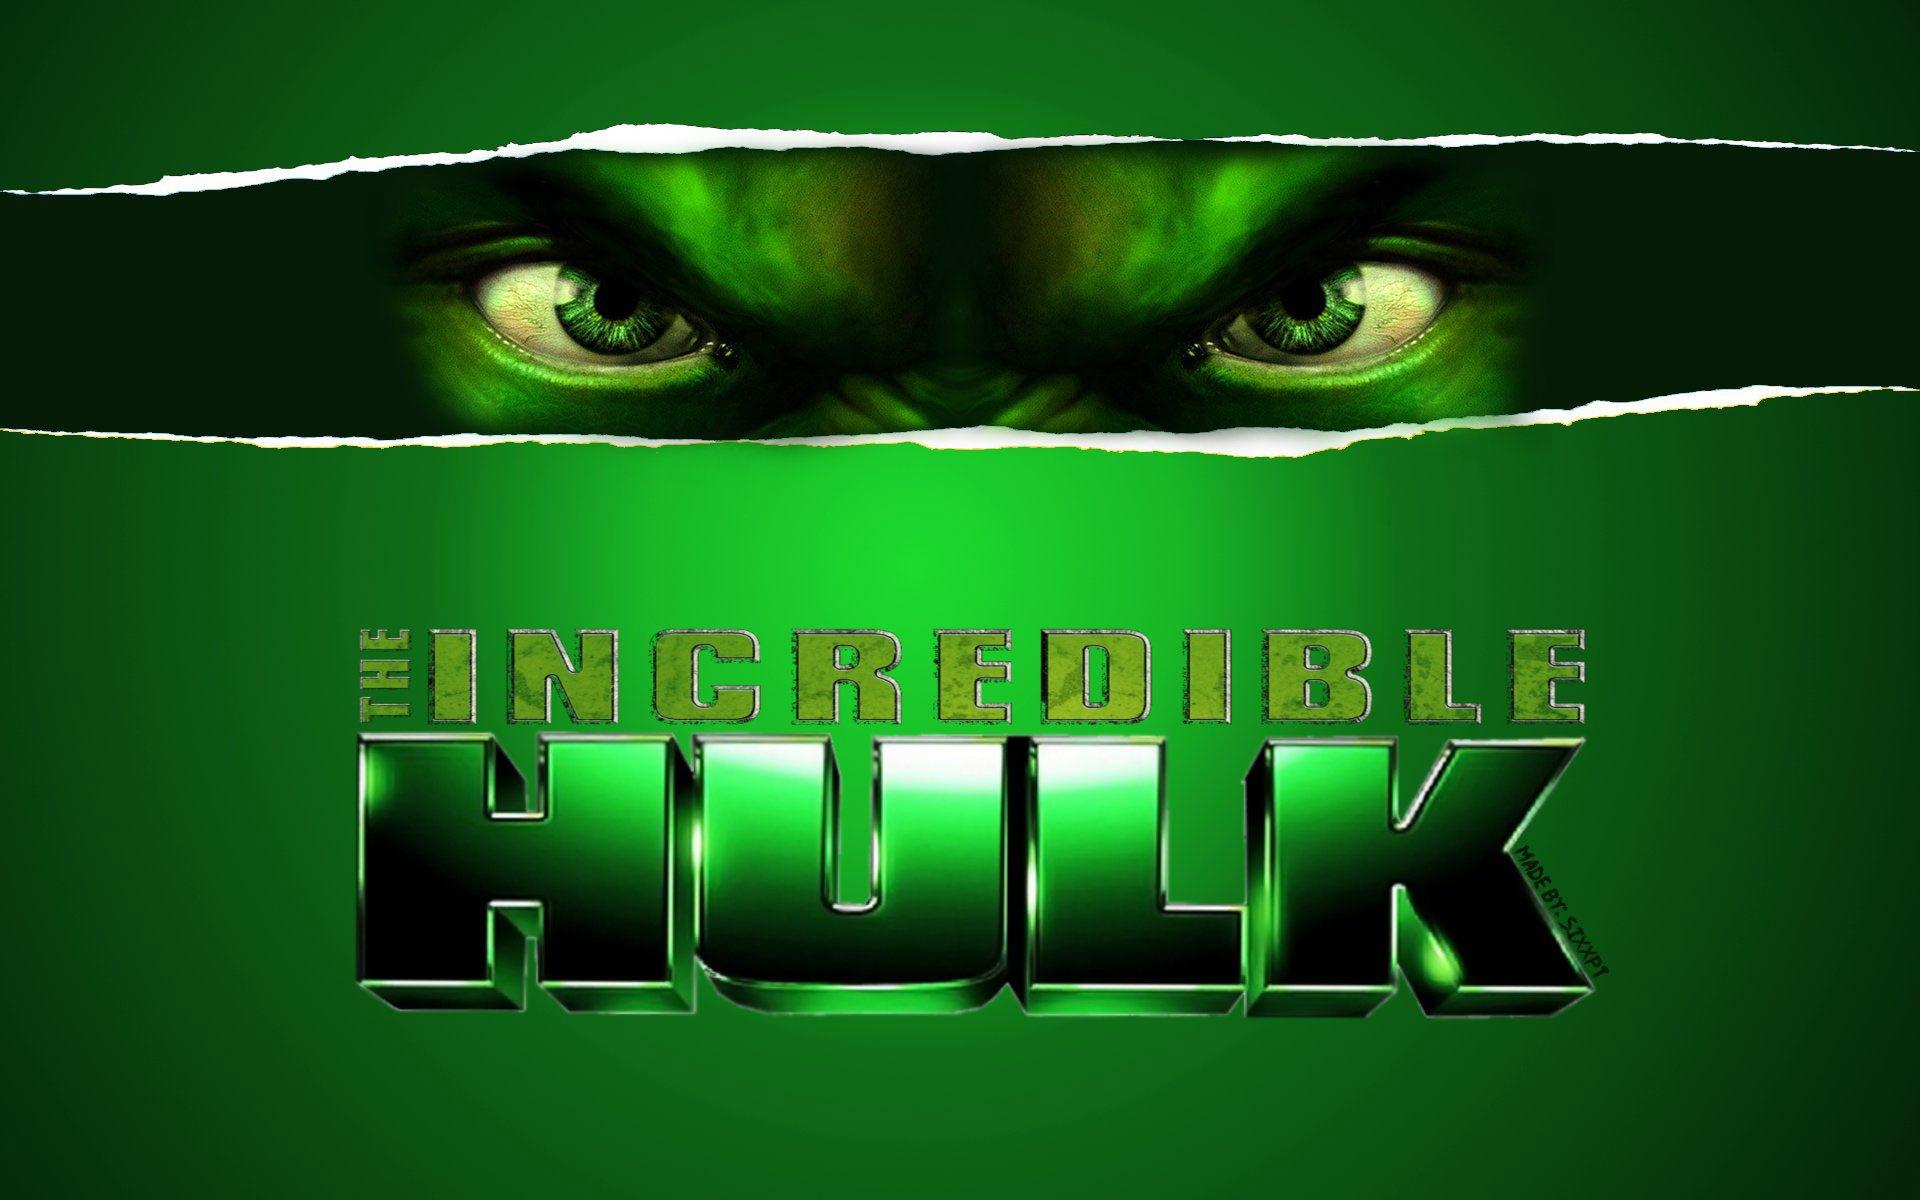 Movie - The Incredible Hulk  Wallpaper